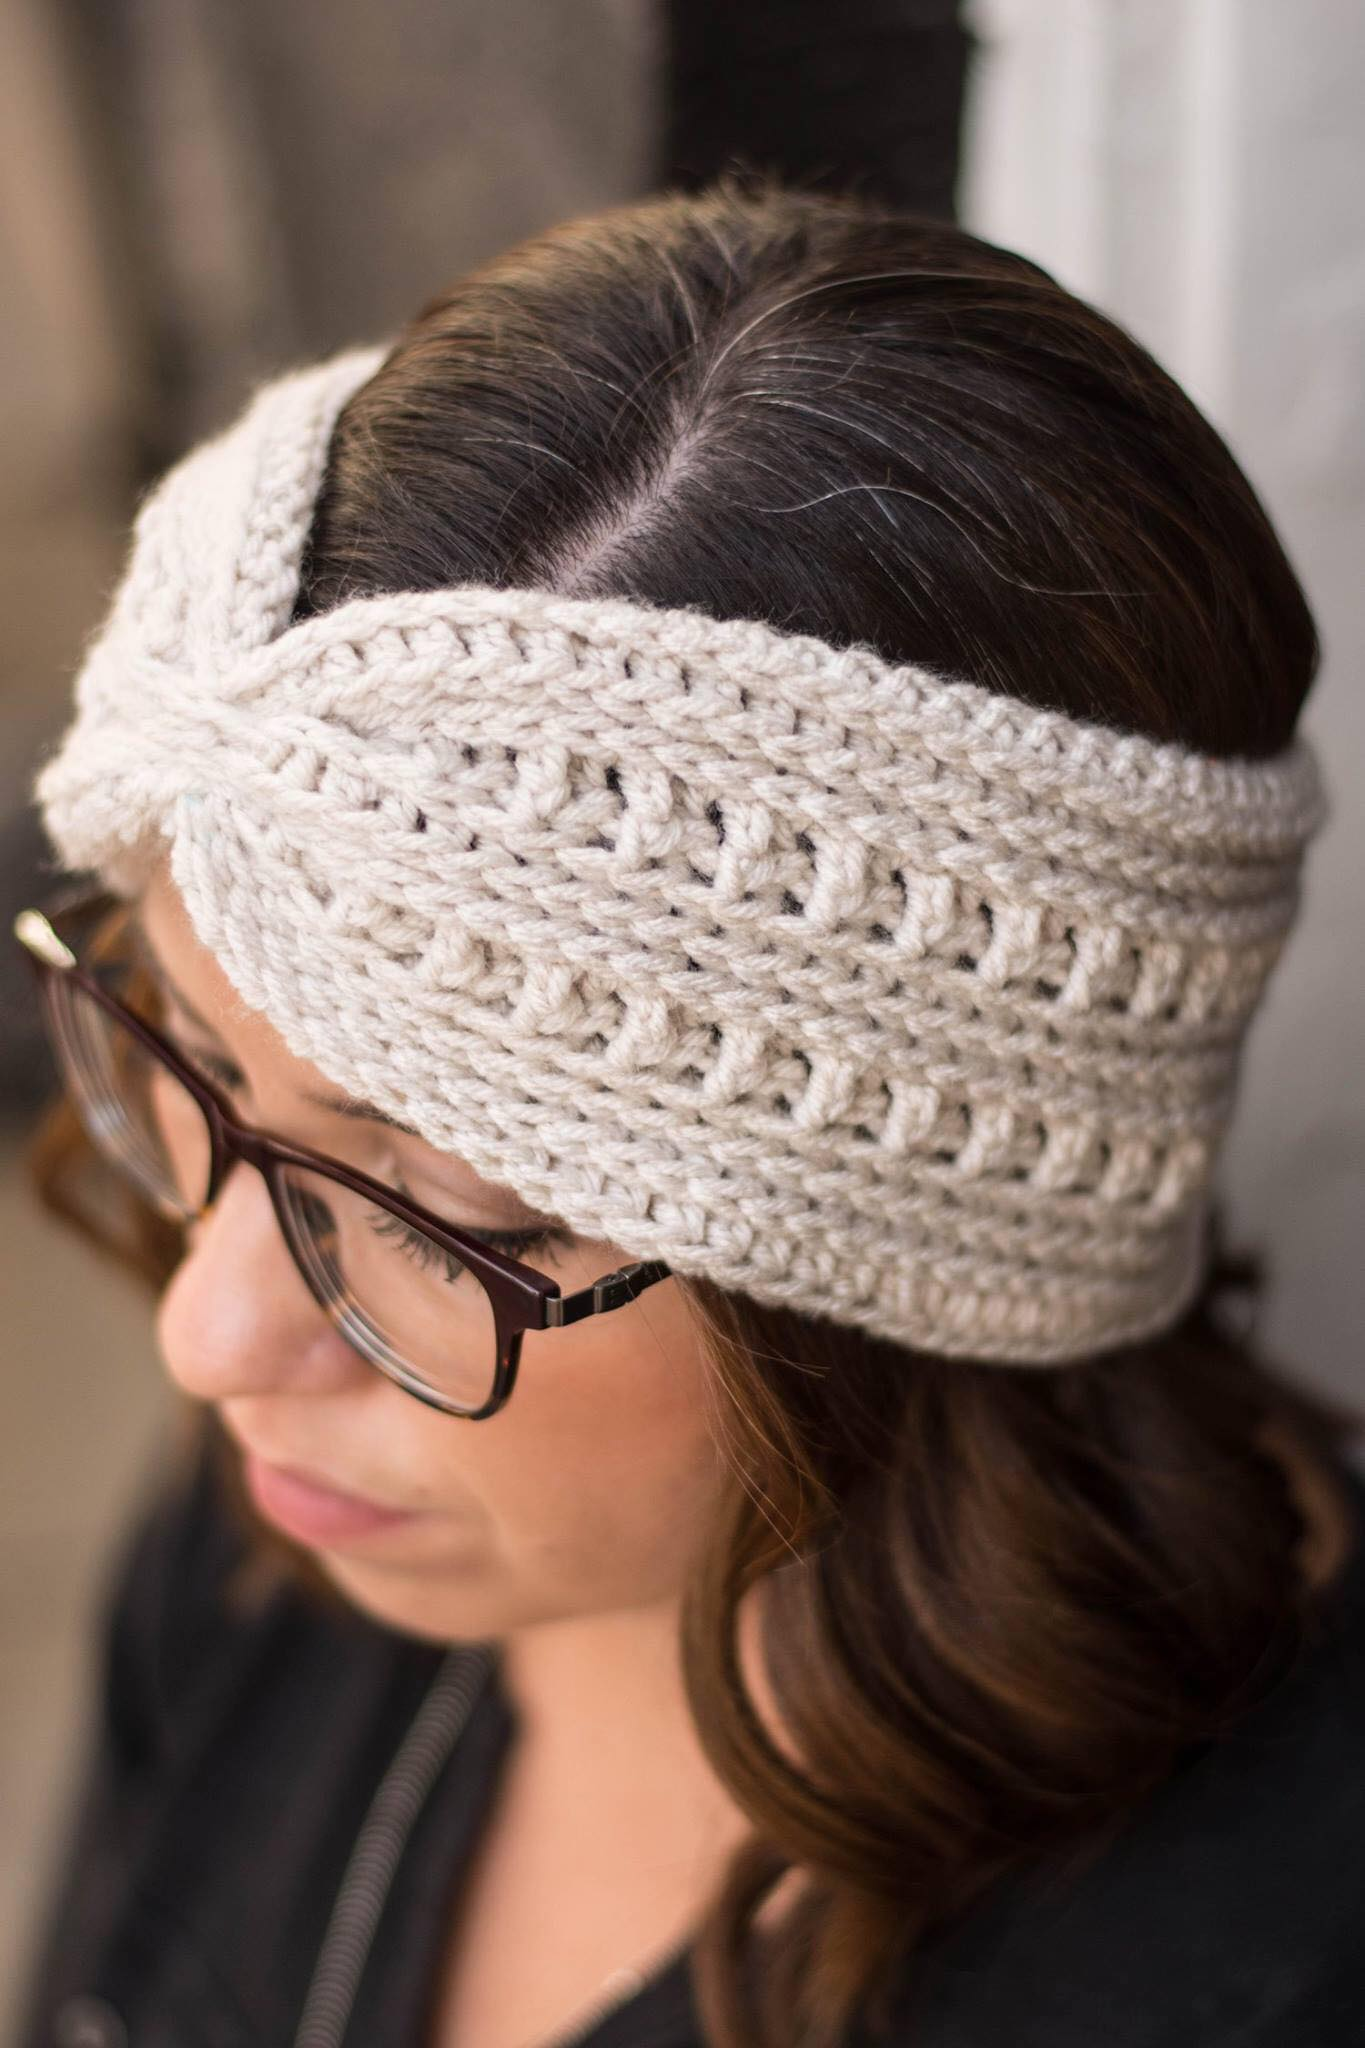 Head Warmer Headband : warmer, headband, Warmer, Headband, Crochet, Pattern, Creations